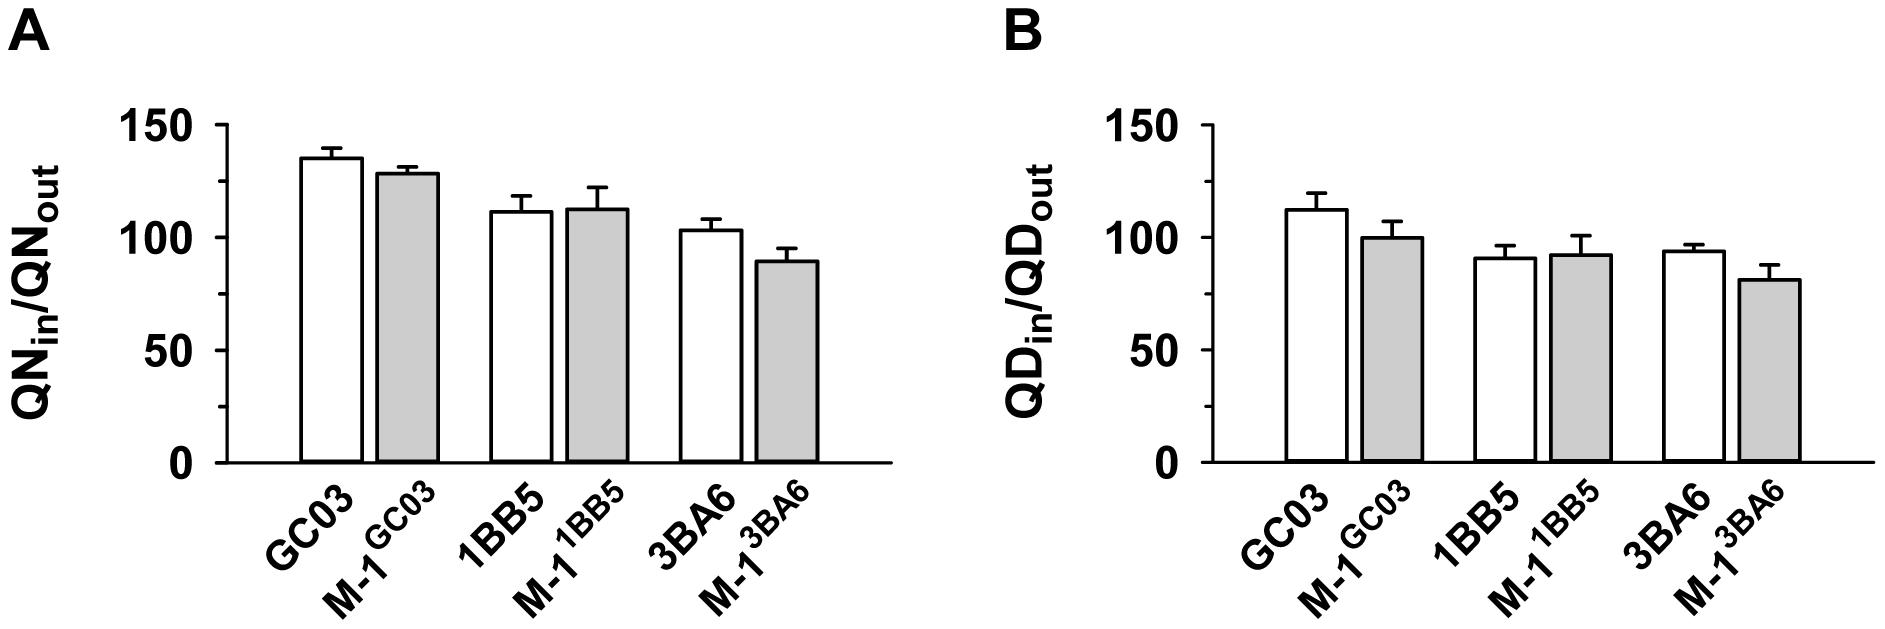 Effect of <i>pfnhe</i> on quinine and quinidine accumulation.